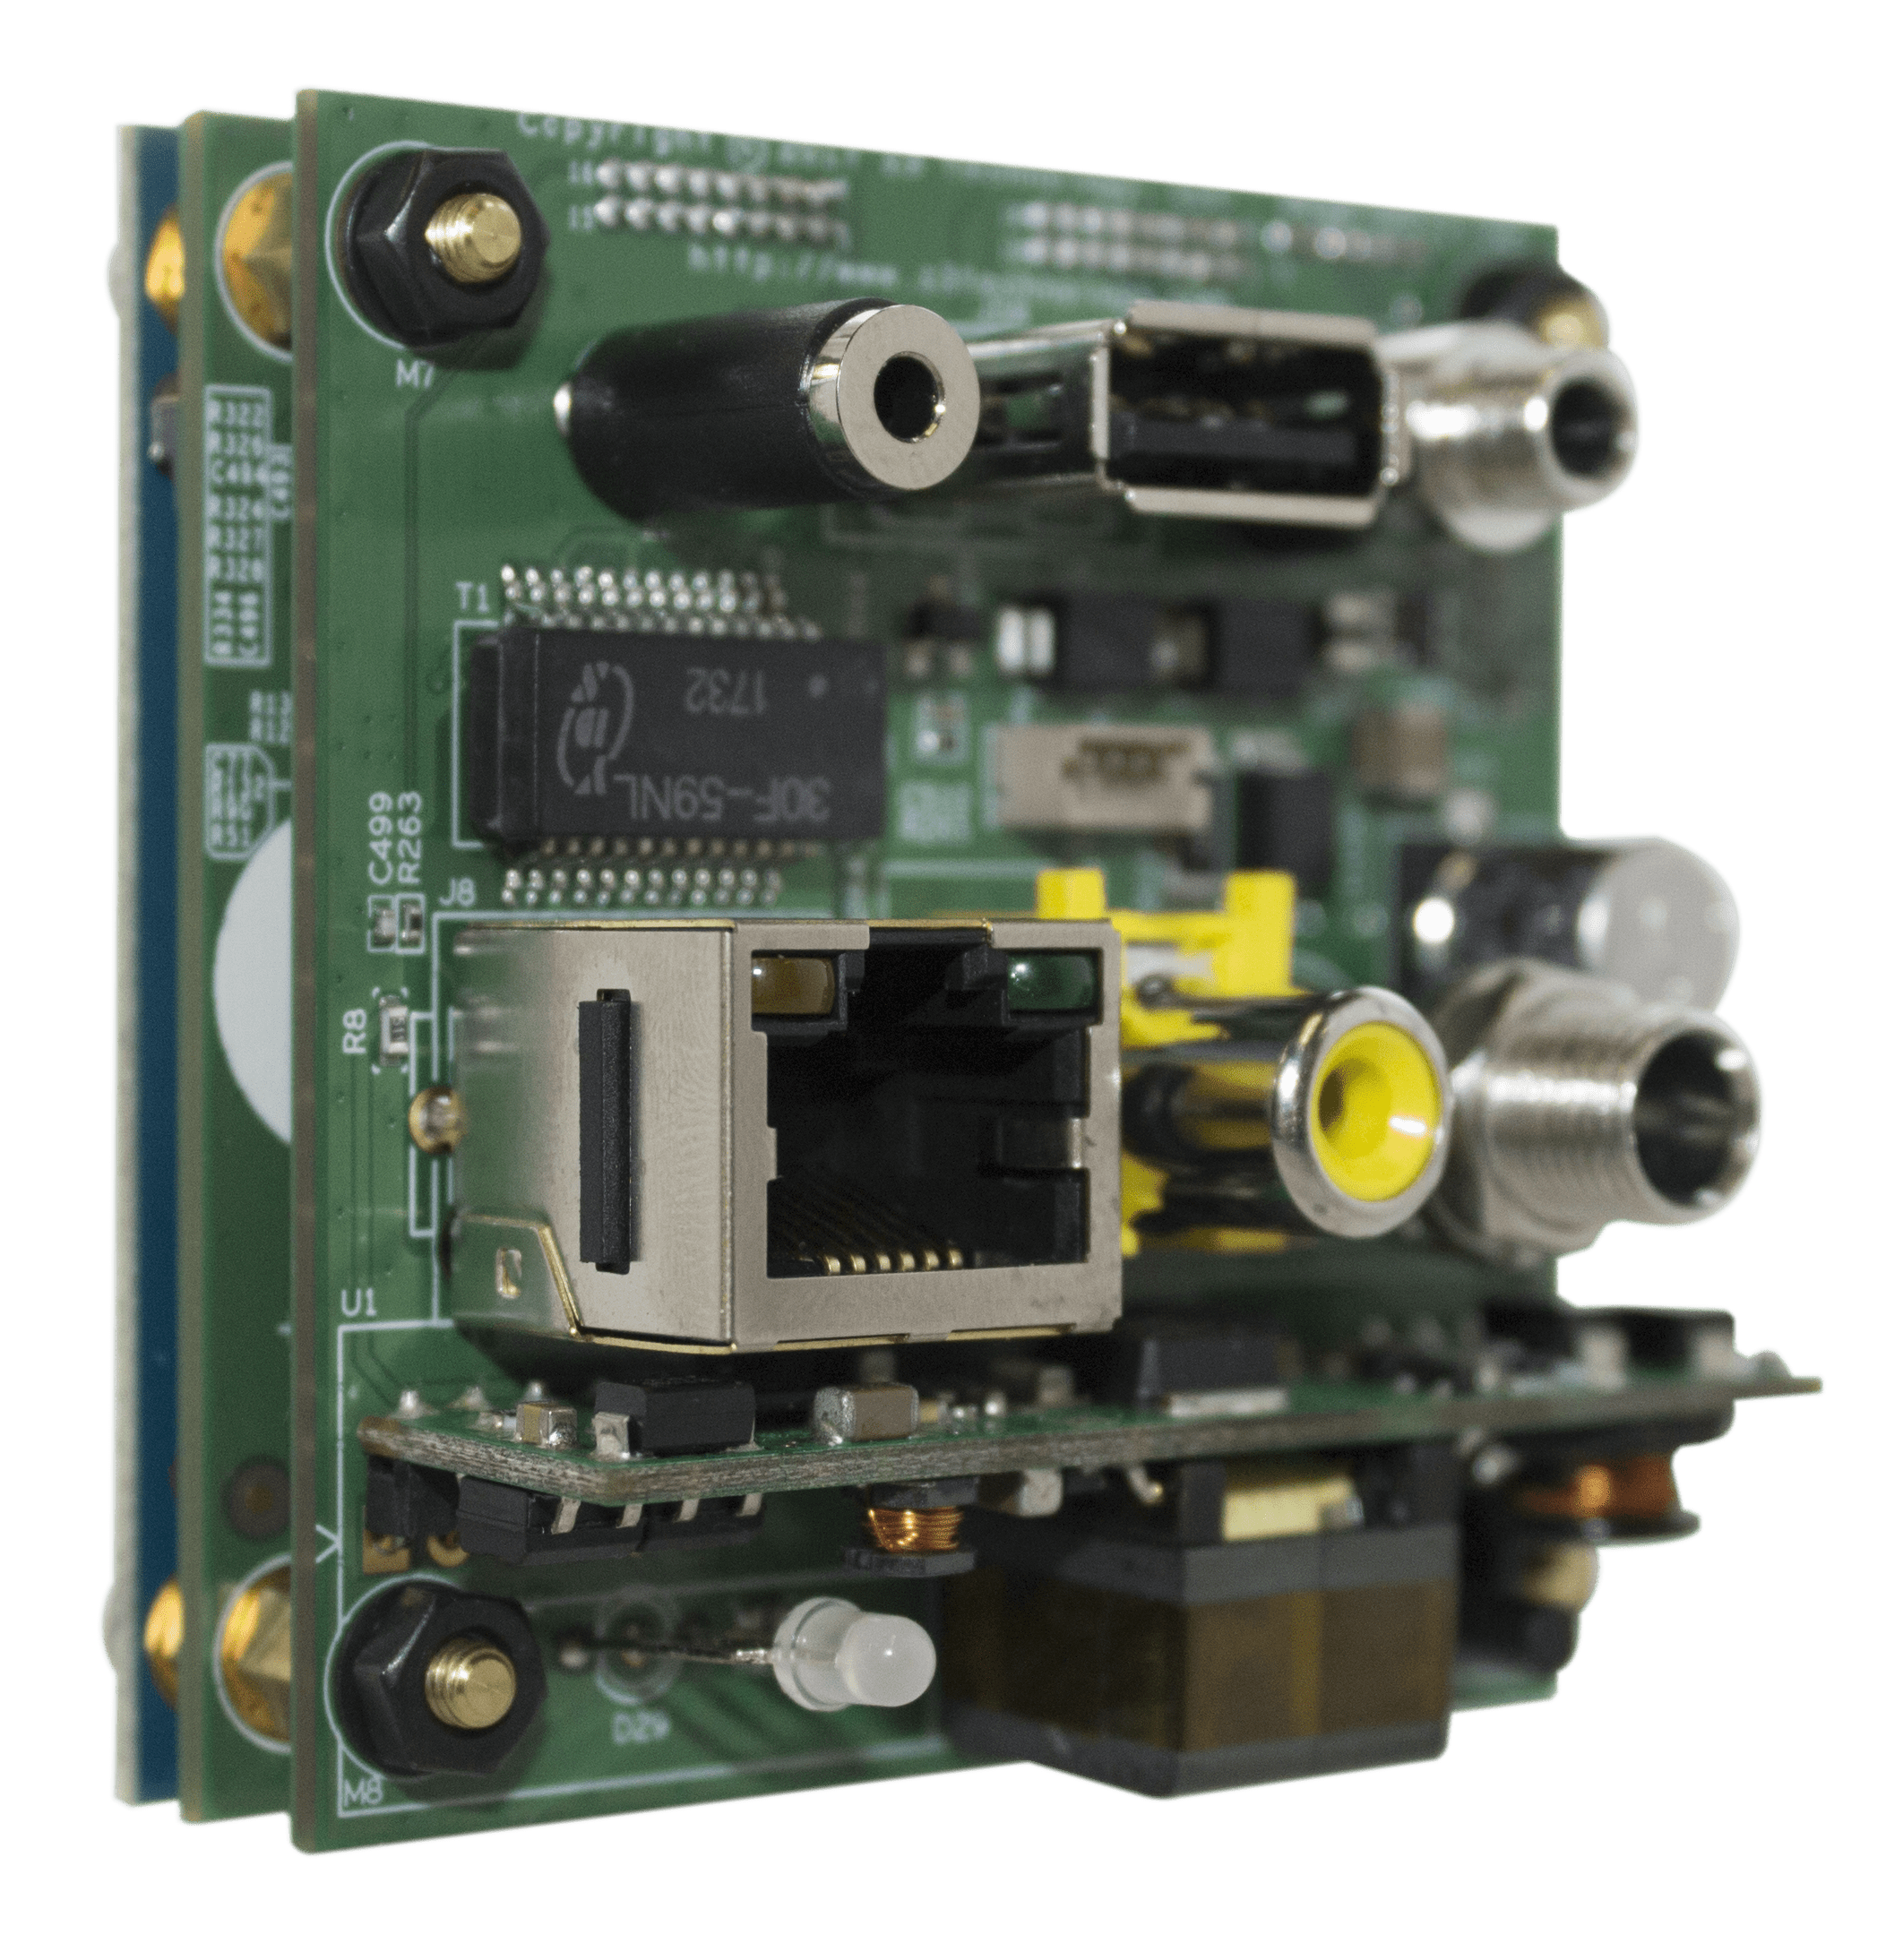 FV4K Full 4K Video Encoder   Unmanned Systems Technology